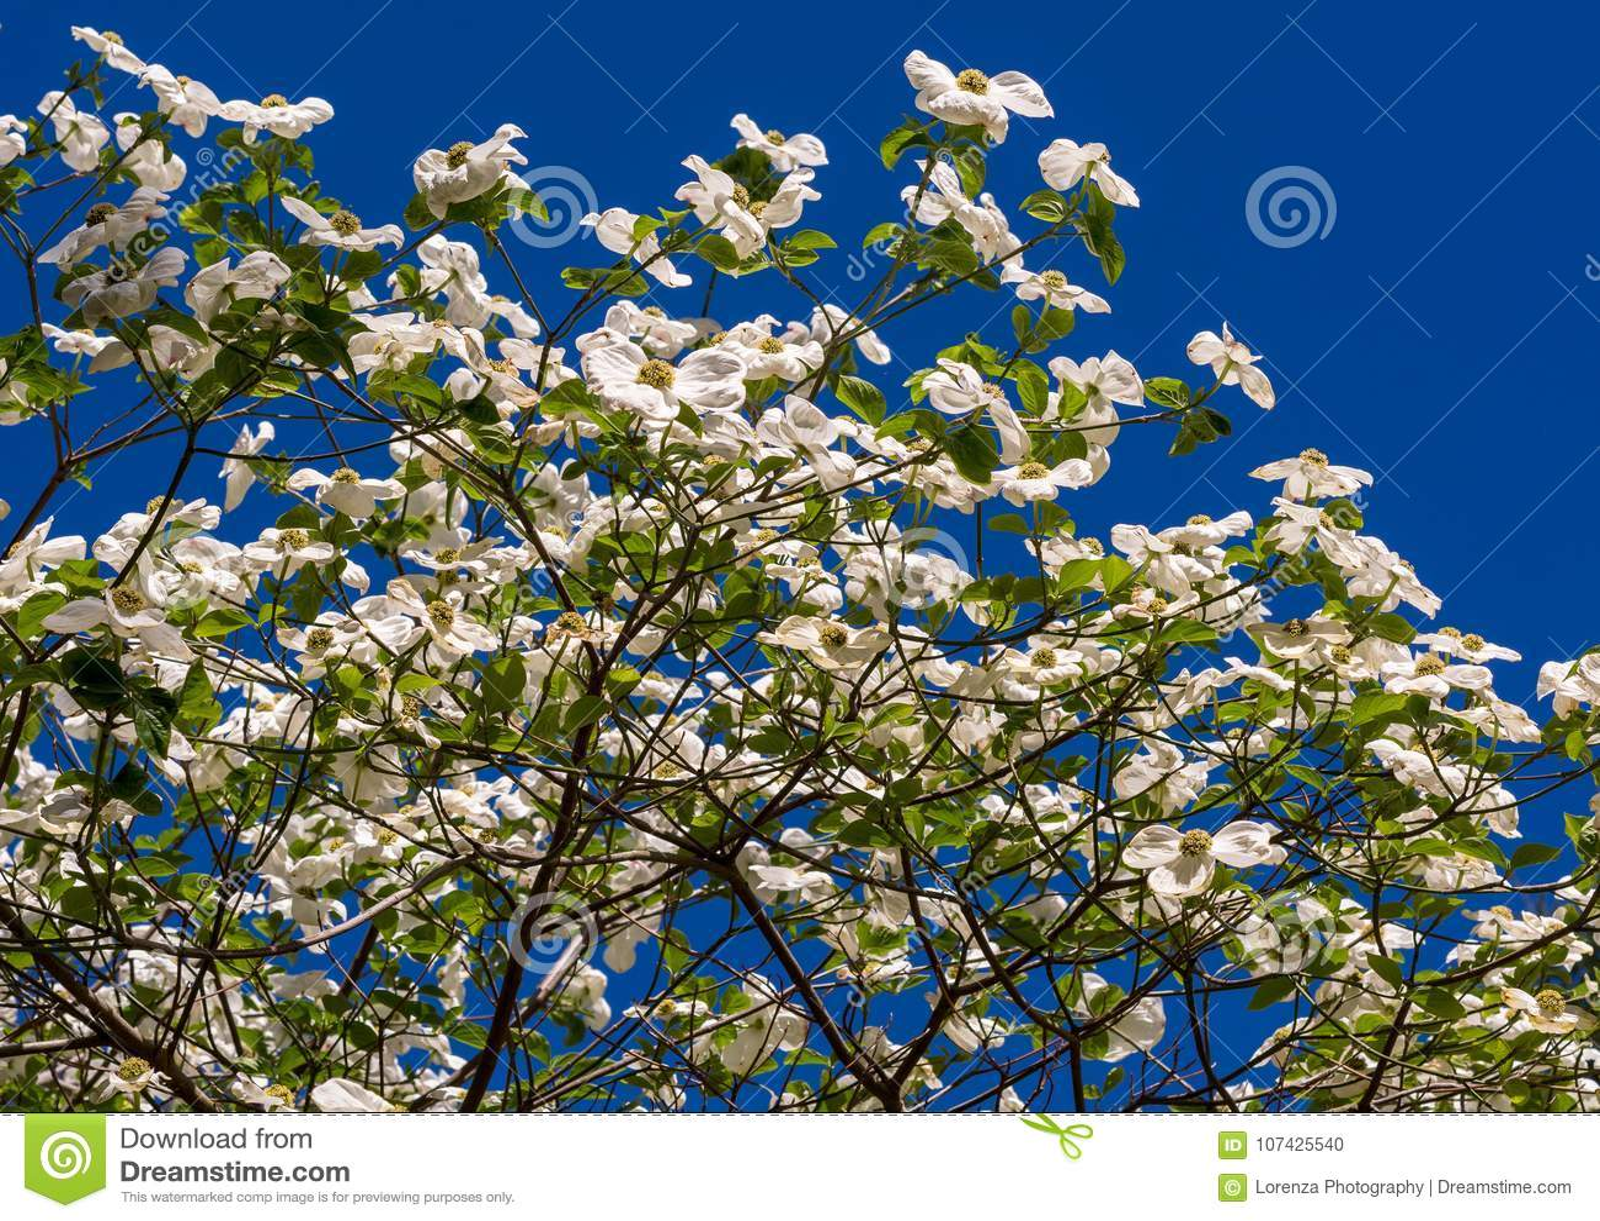 White dogwood tree cornus florida in full bloom in springtime stock white dogwood tree cornus florida in full bloom in springtime flowering dogwood mightylinksfo